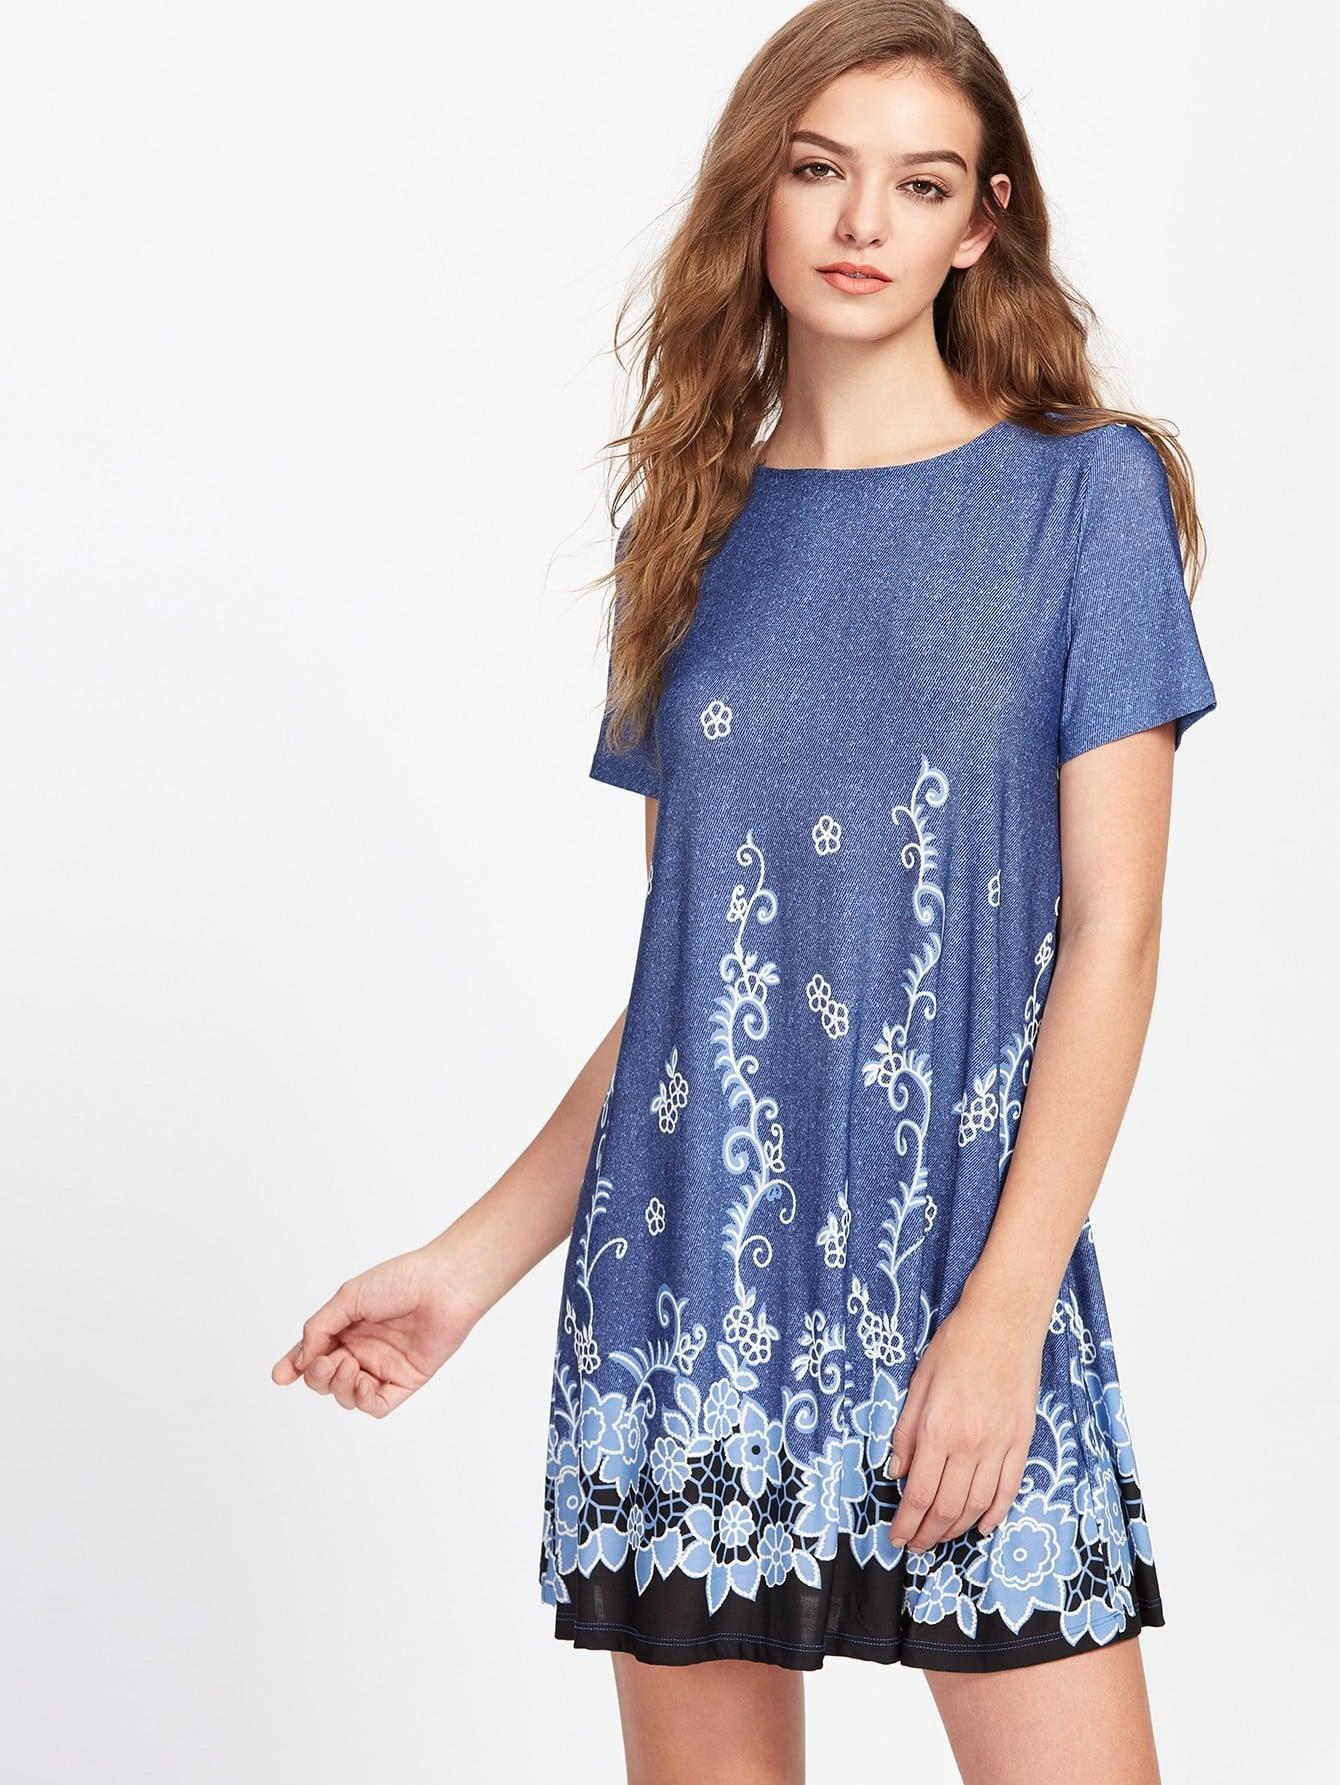 Vine Flower Print Flowy Dress пылесборник для сухой уборки topperr er 2